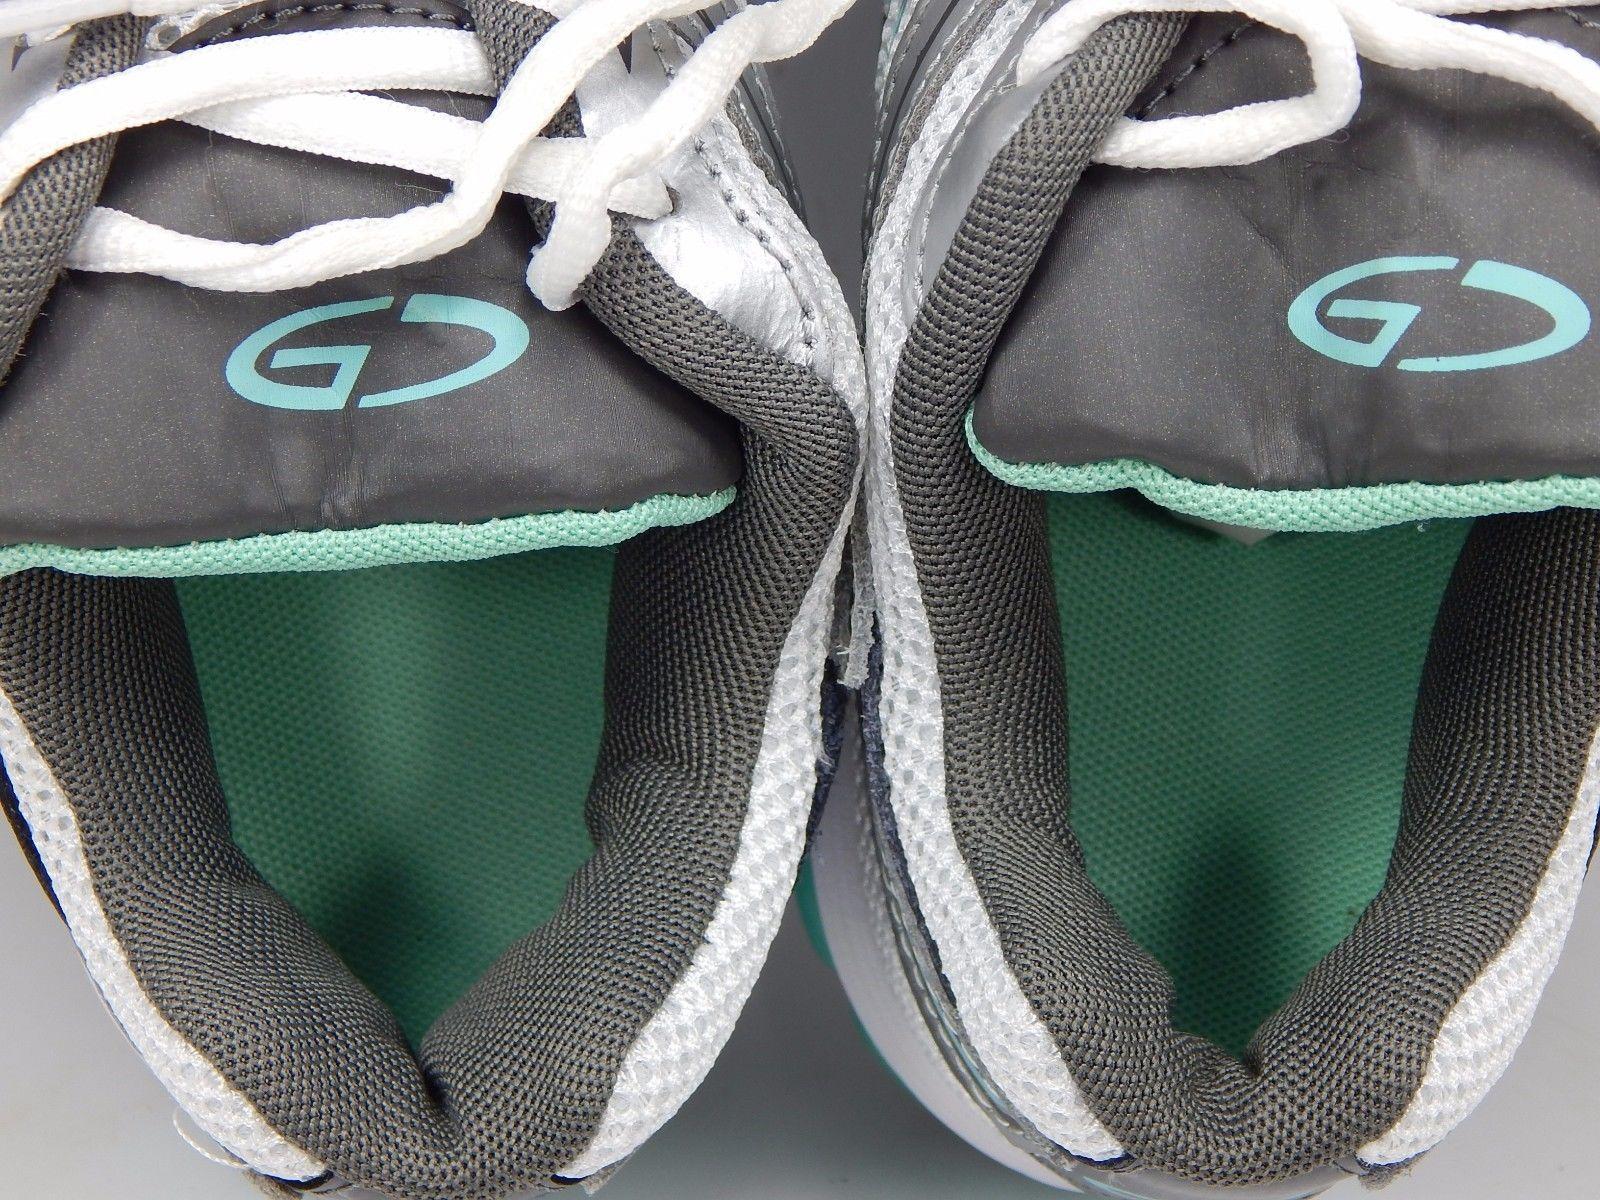 Champion 098072559 Women's Running Shoes Size US 9 M (B) EU 41.5 F16893092